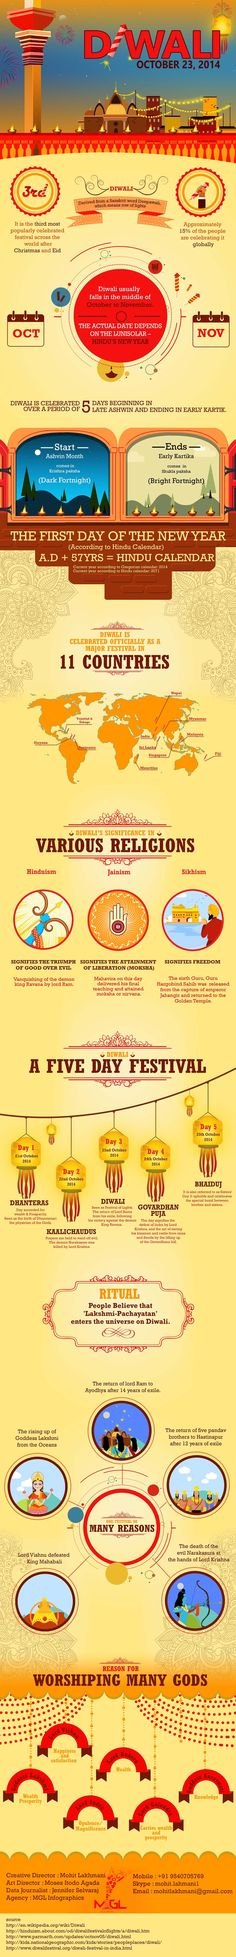 Diwali - festival of lights Infographic